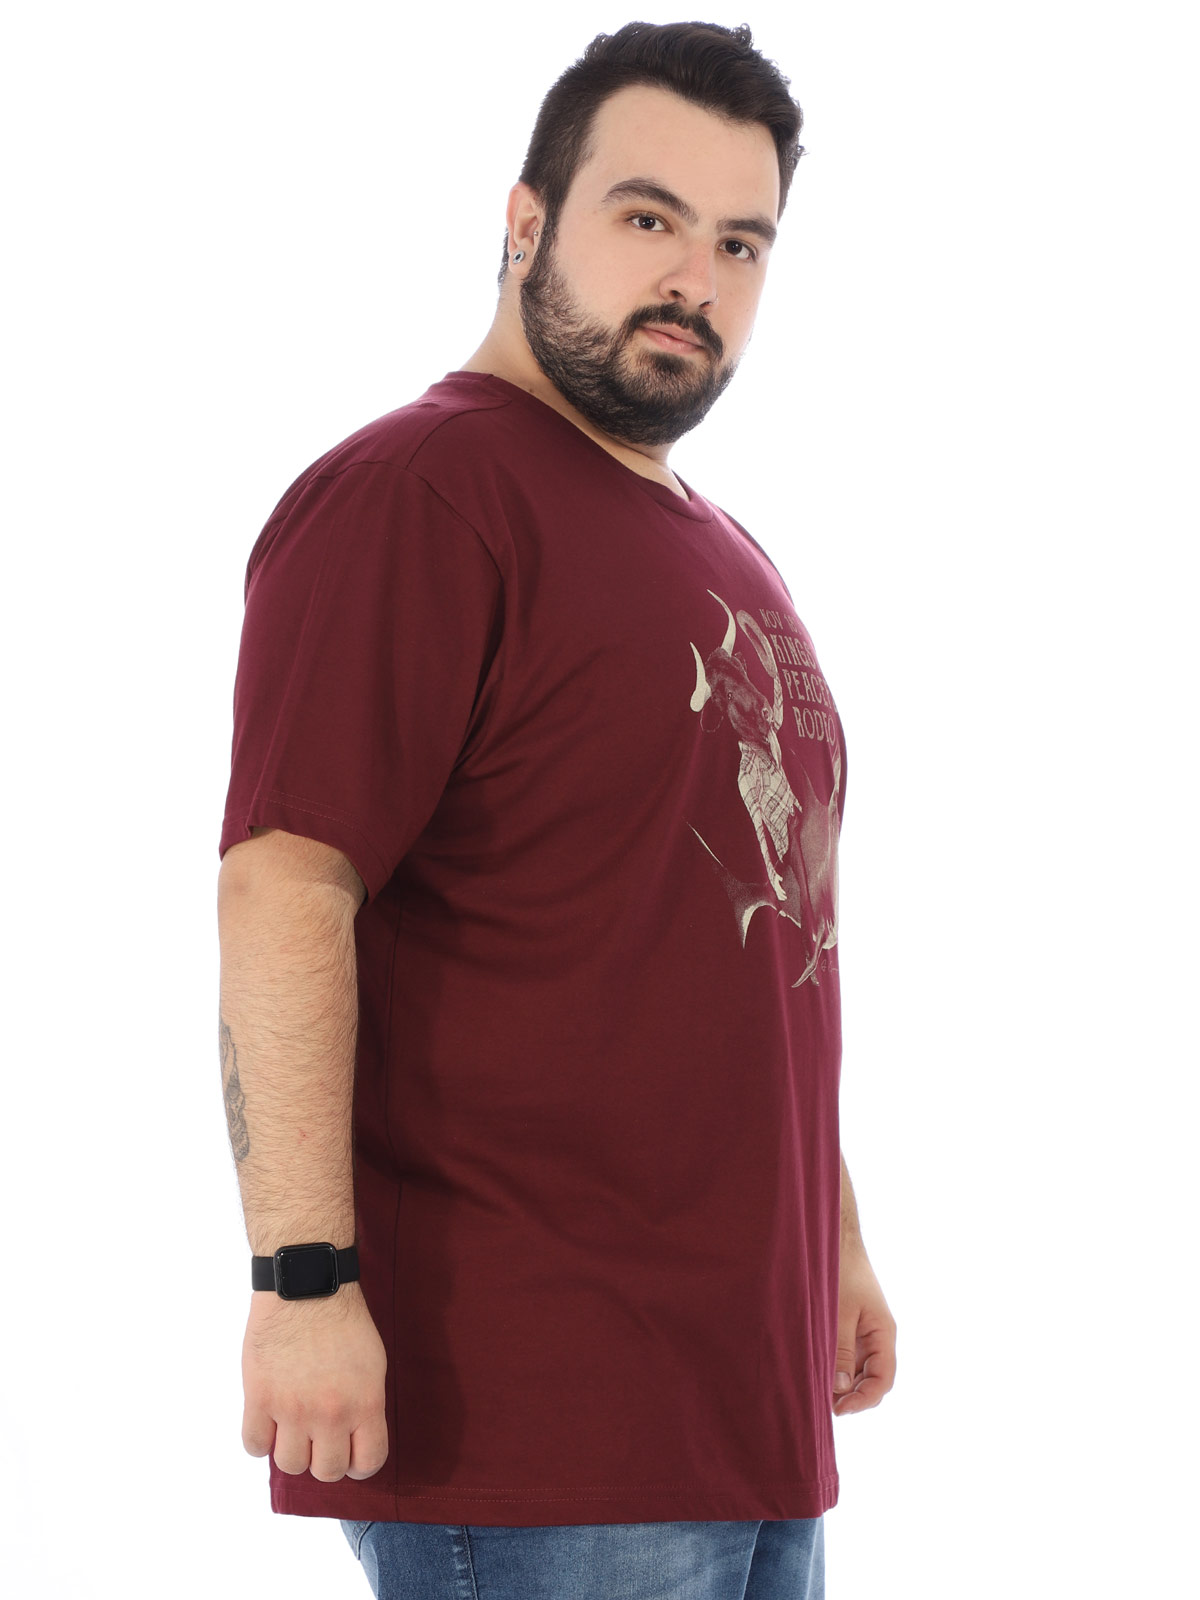 Camiseta Plus Size Masculina Estampada Rodeo Anistia Vinho